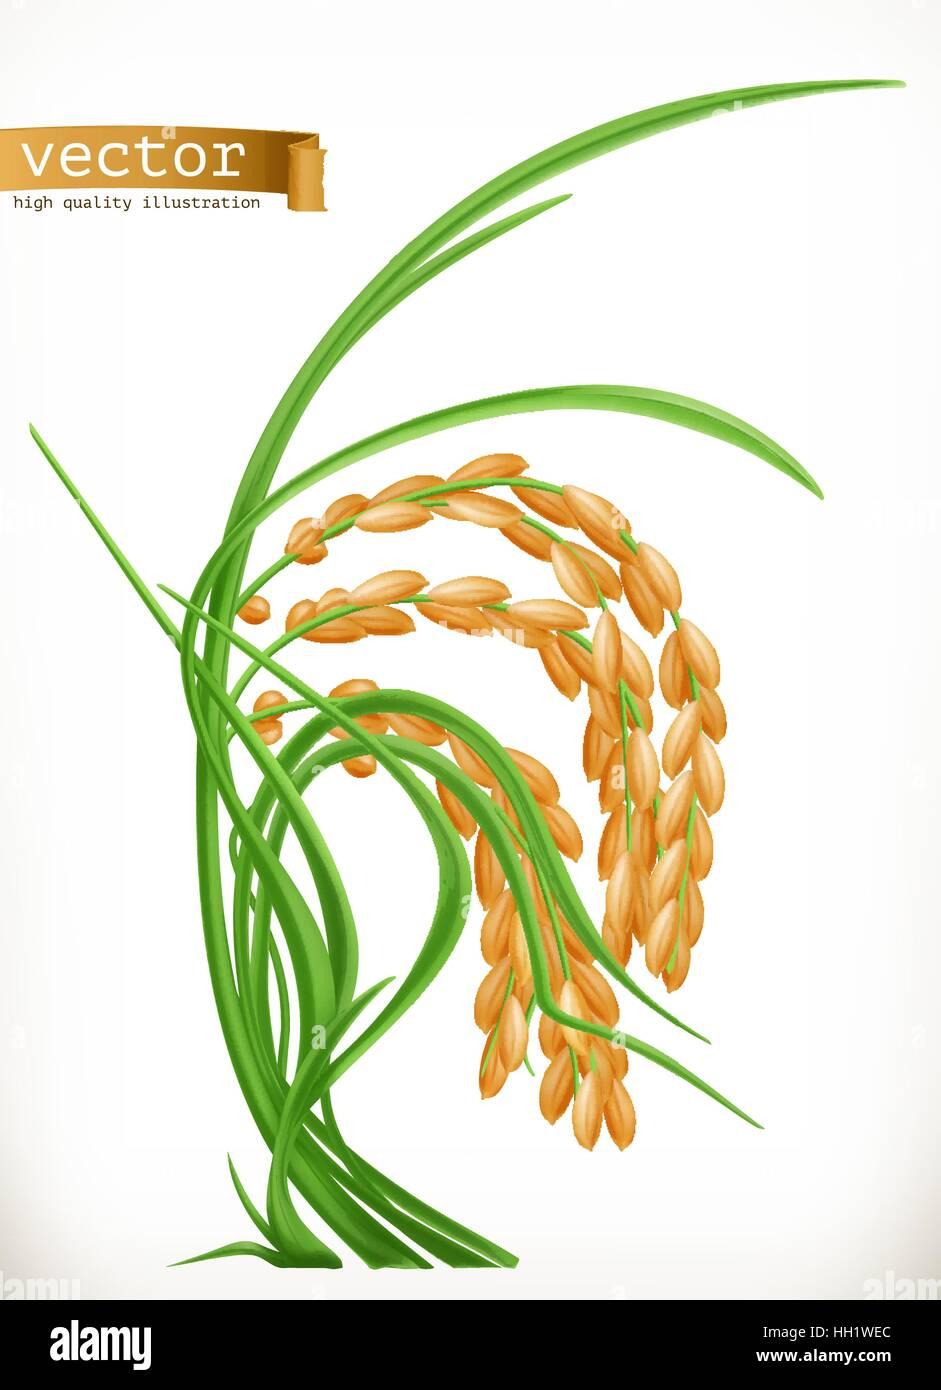 Gambar Padi Vector : gambar, vector, Rice., Vector, Stock, Image, Alamy